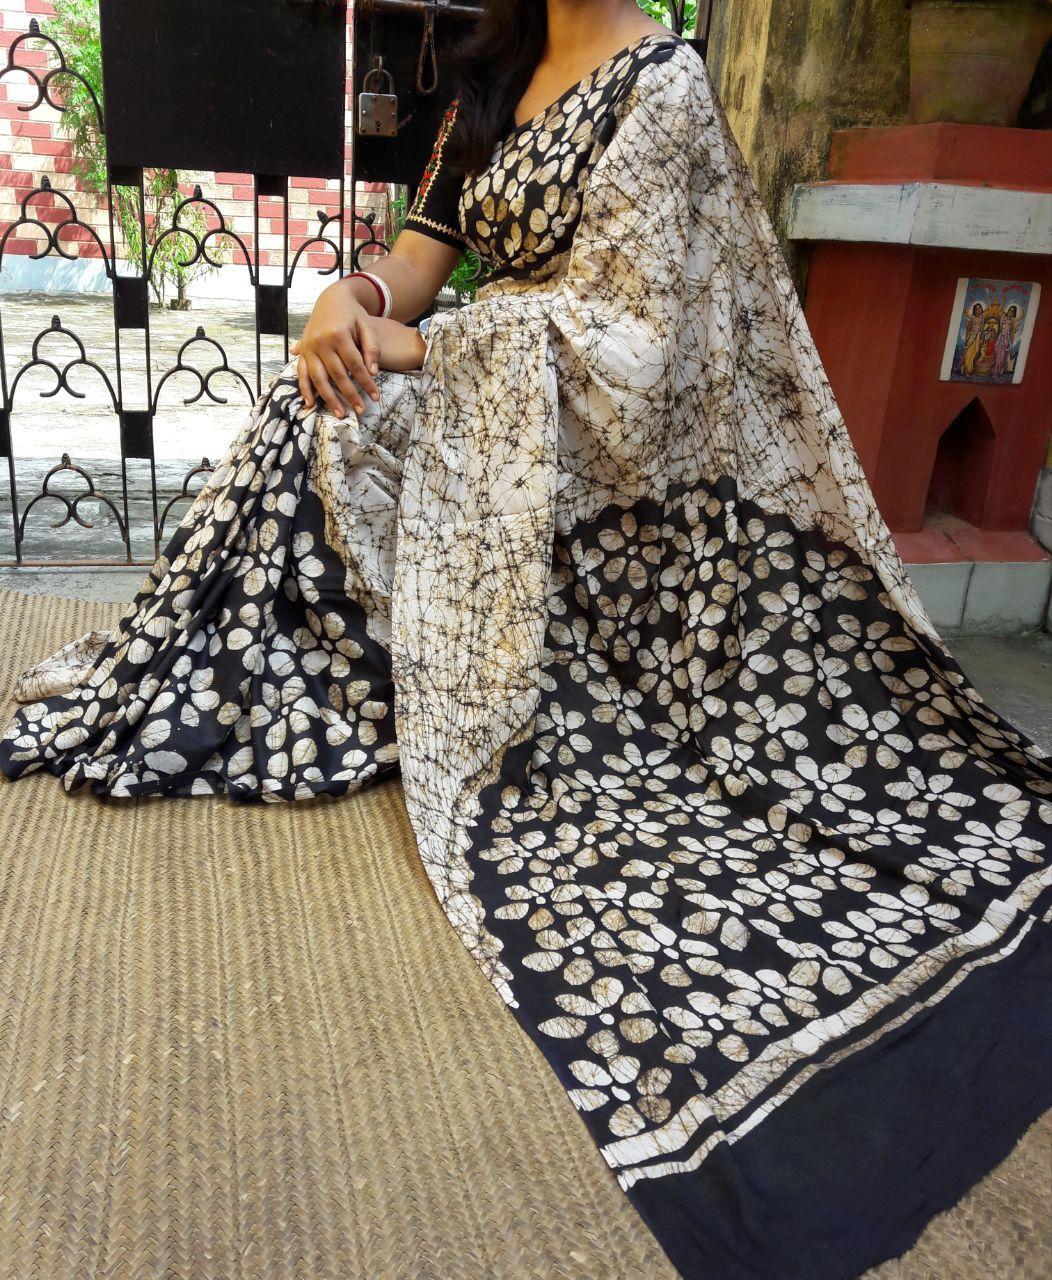 e43aa80b78 Malmal cotton hand batik with blouse #black and white flower bathik print  saree